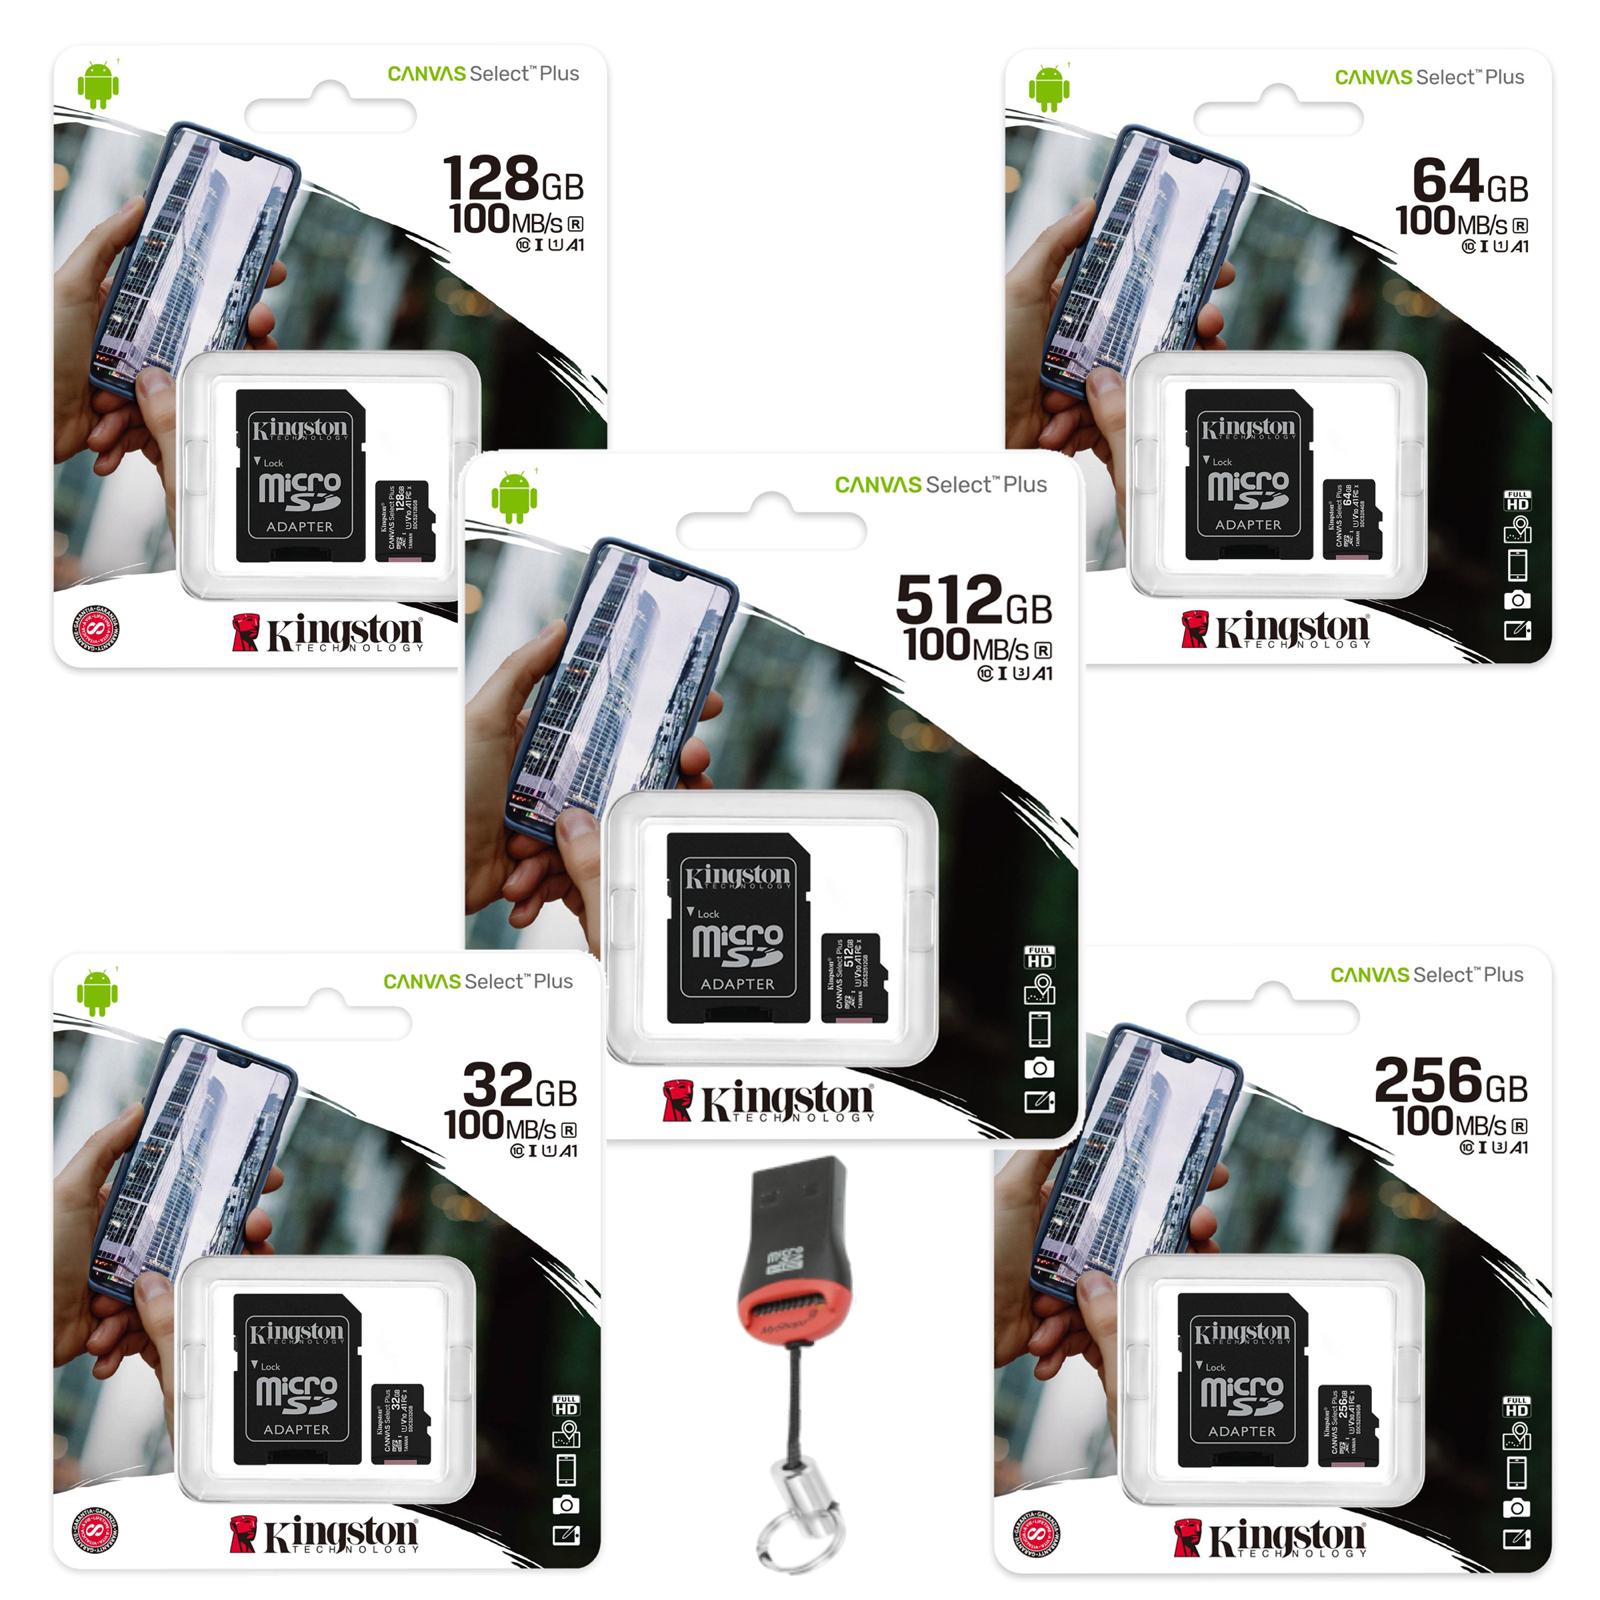 Memory Card Micro SD SDXC Kingston For Samsung Galaxy S10, S10 Lite,S10e